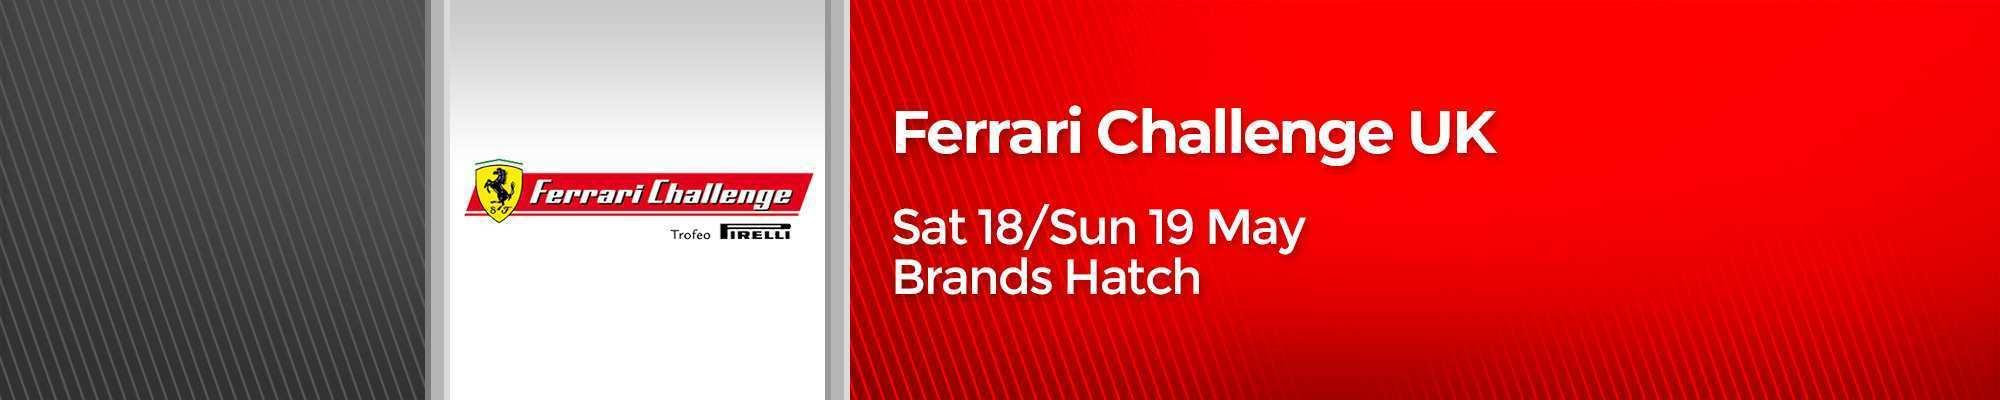 50 Gallery of New Ferrari Challenge 2019 Calendar Price Exterior and Interior for New Ferrari Challenge 2019 Calendar Price